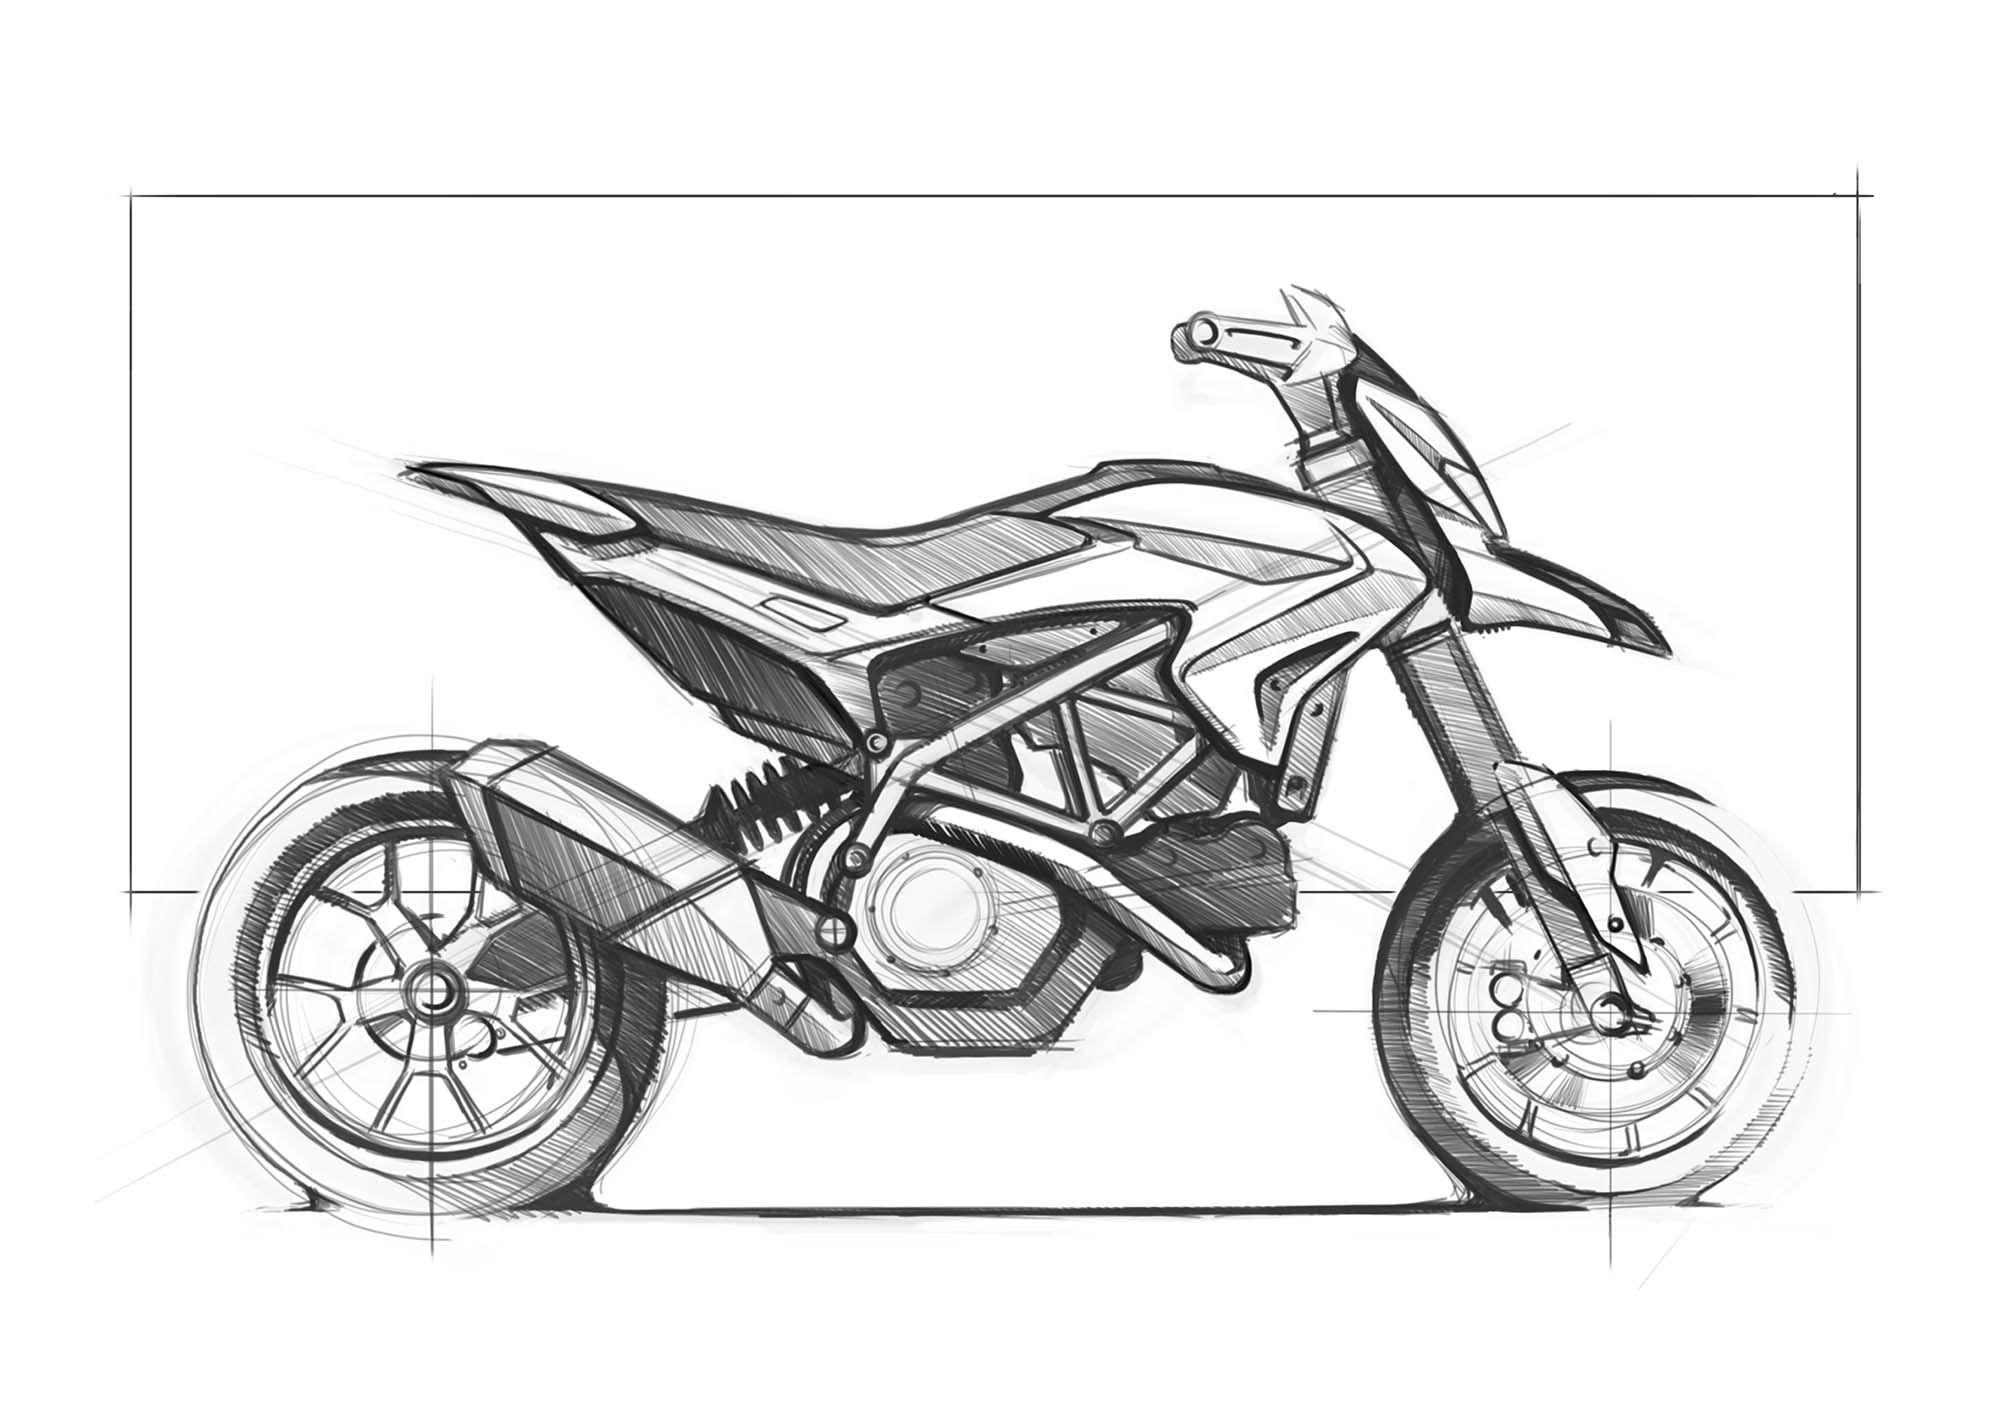 Ducati Hypermotard Sketch